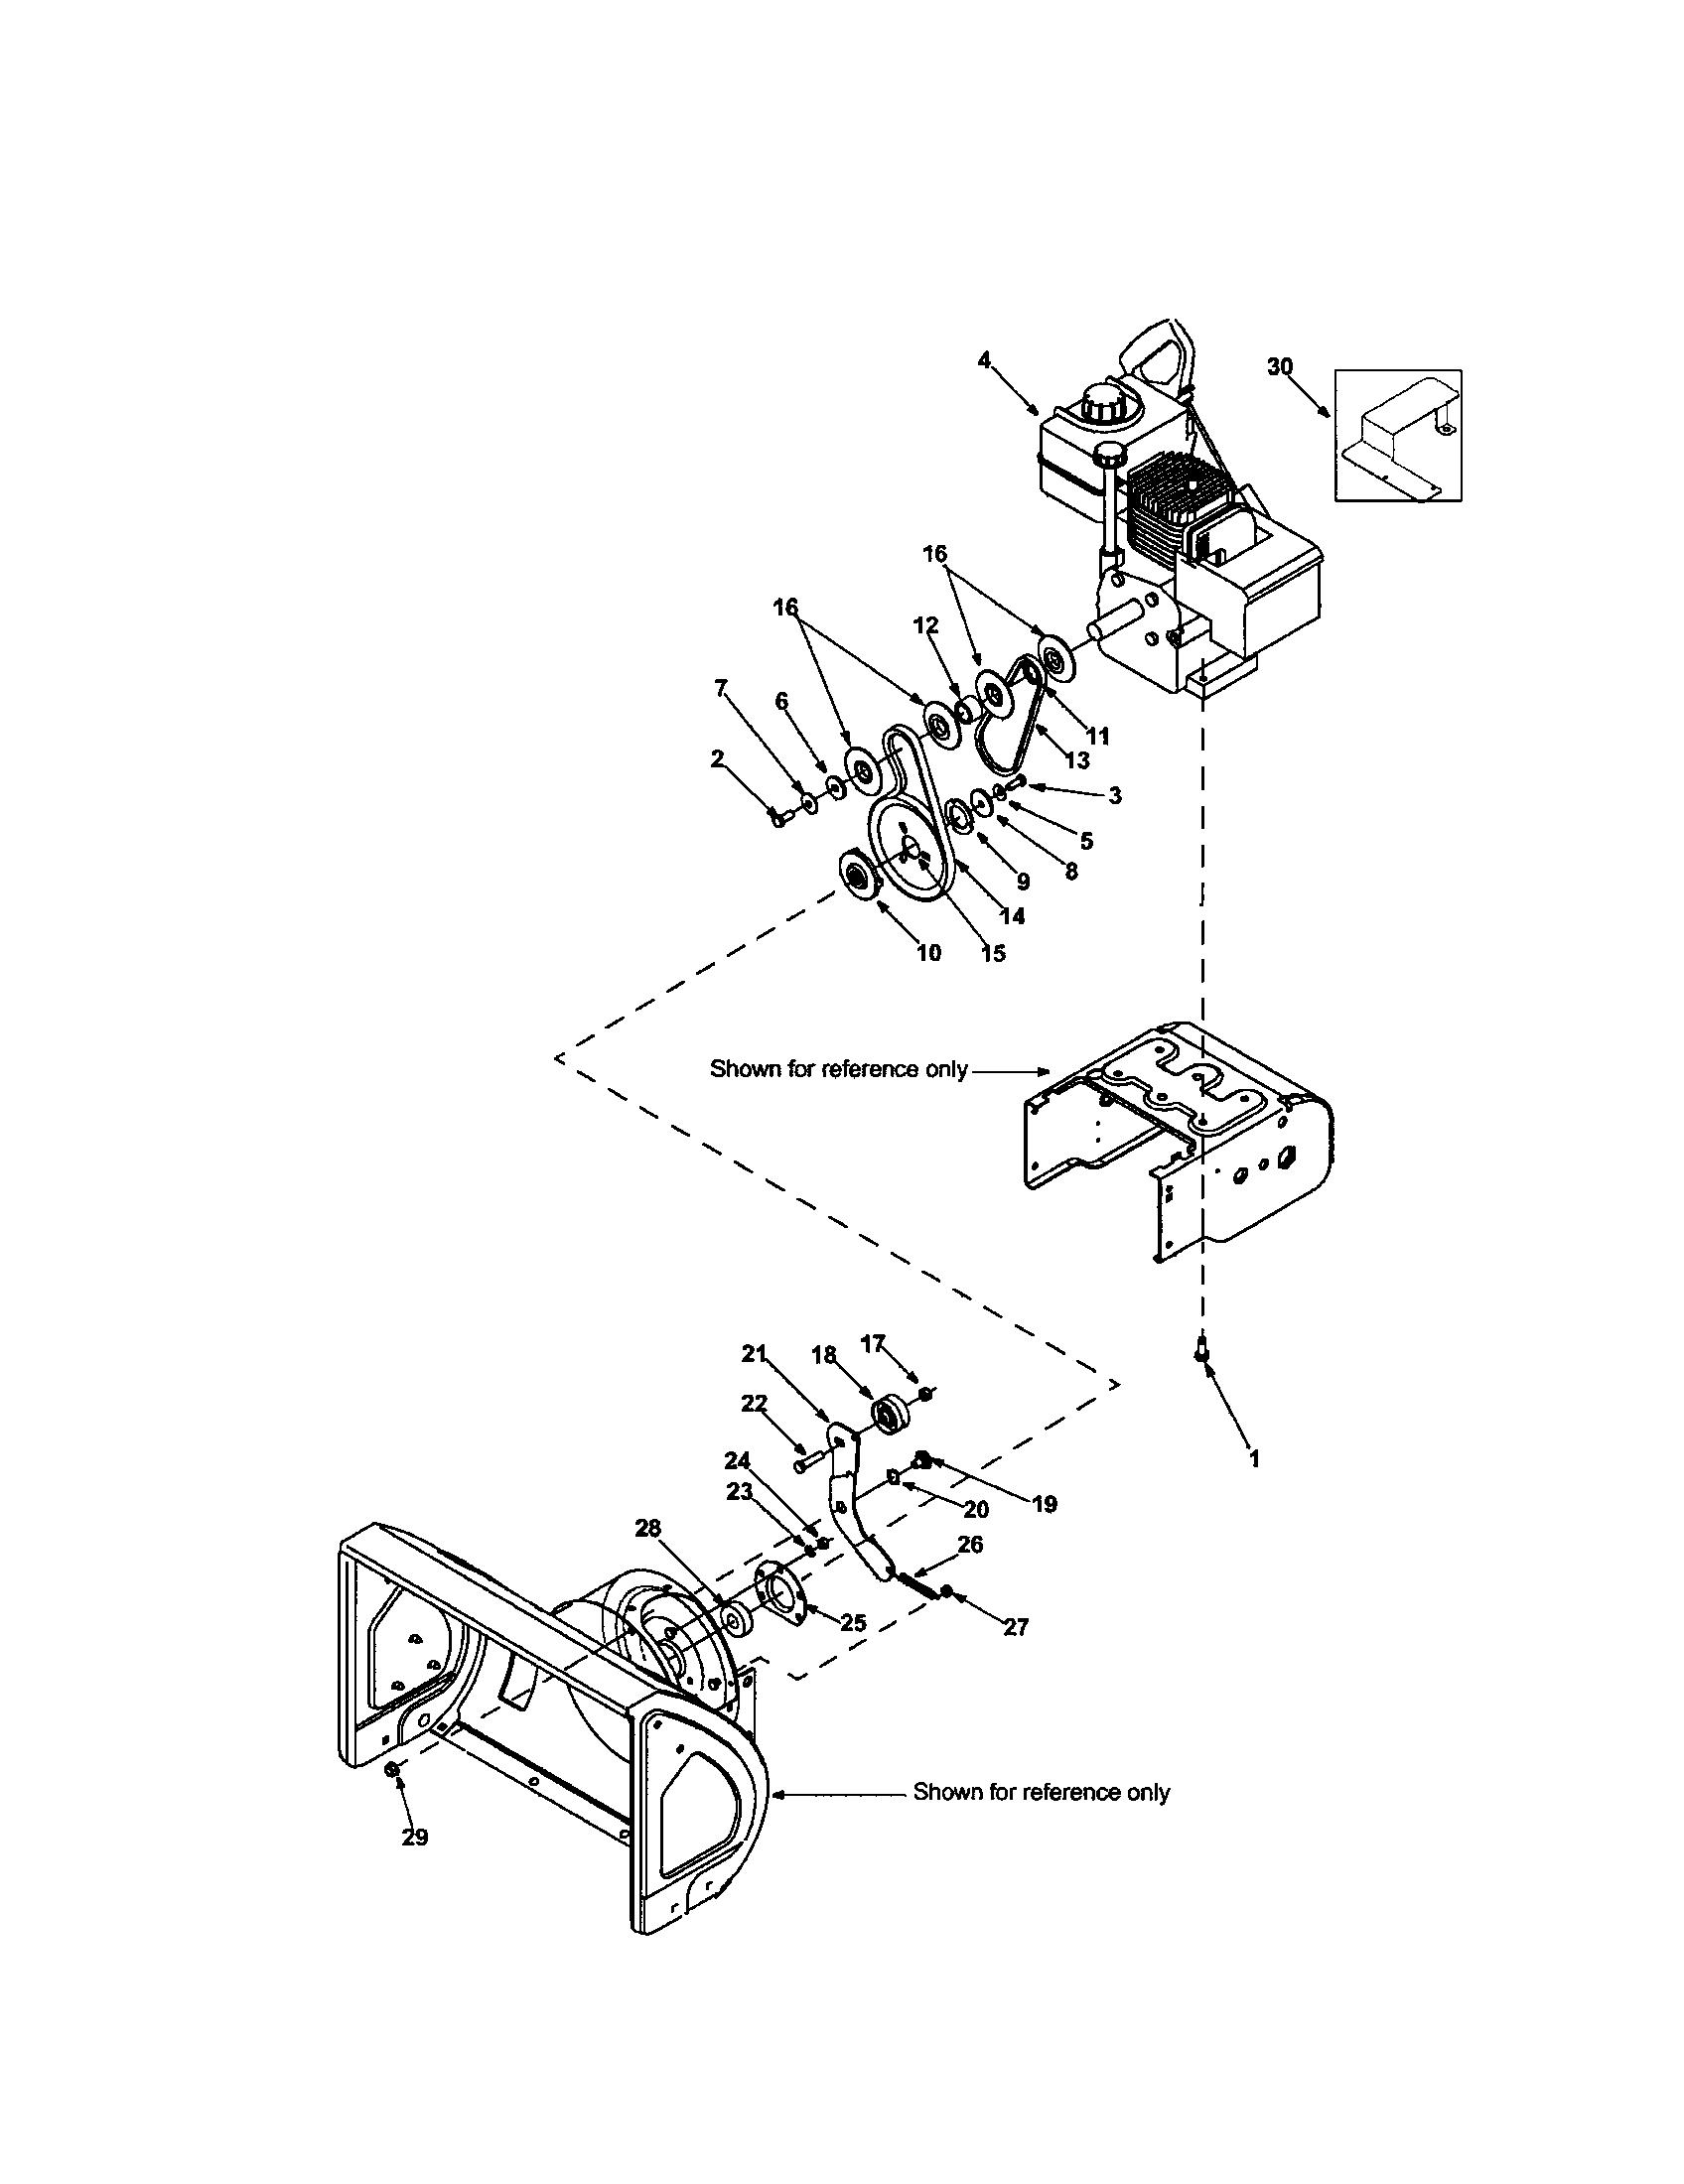 Craftsman model 247887000 snowthrower, gas genuine parts